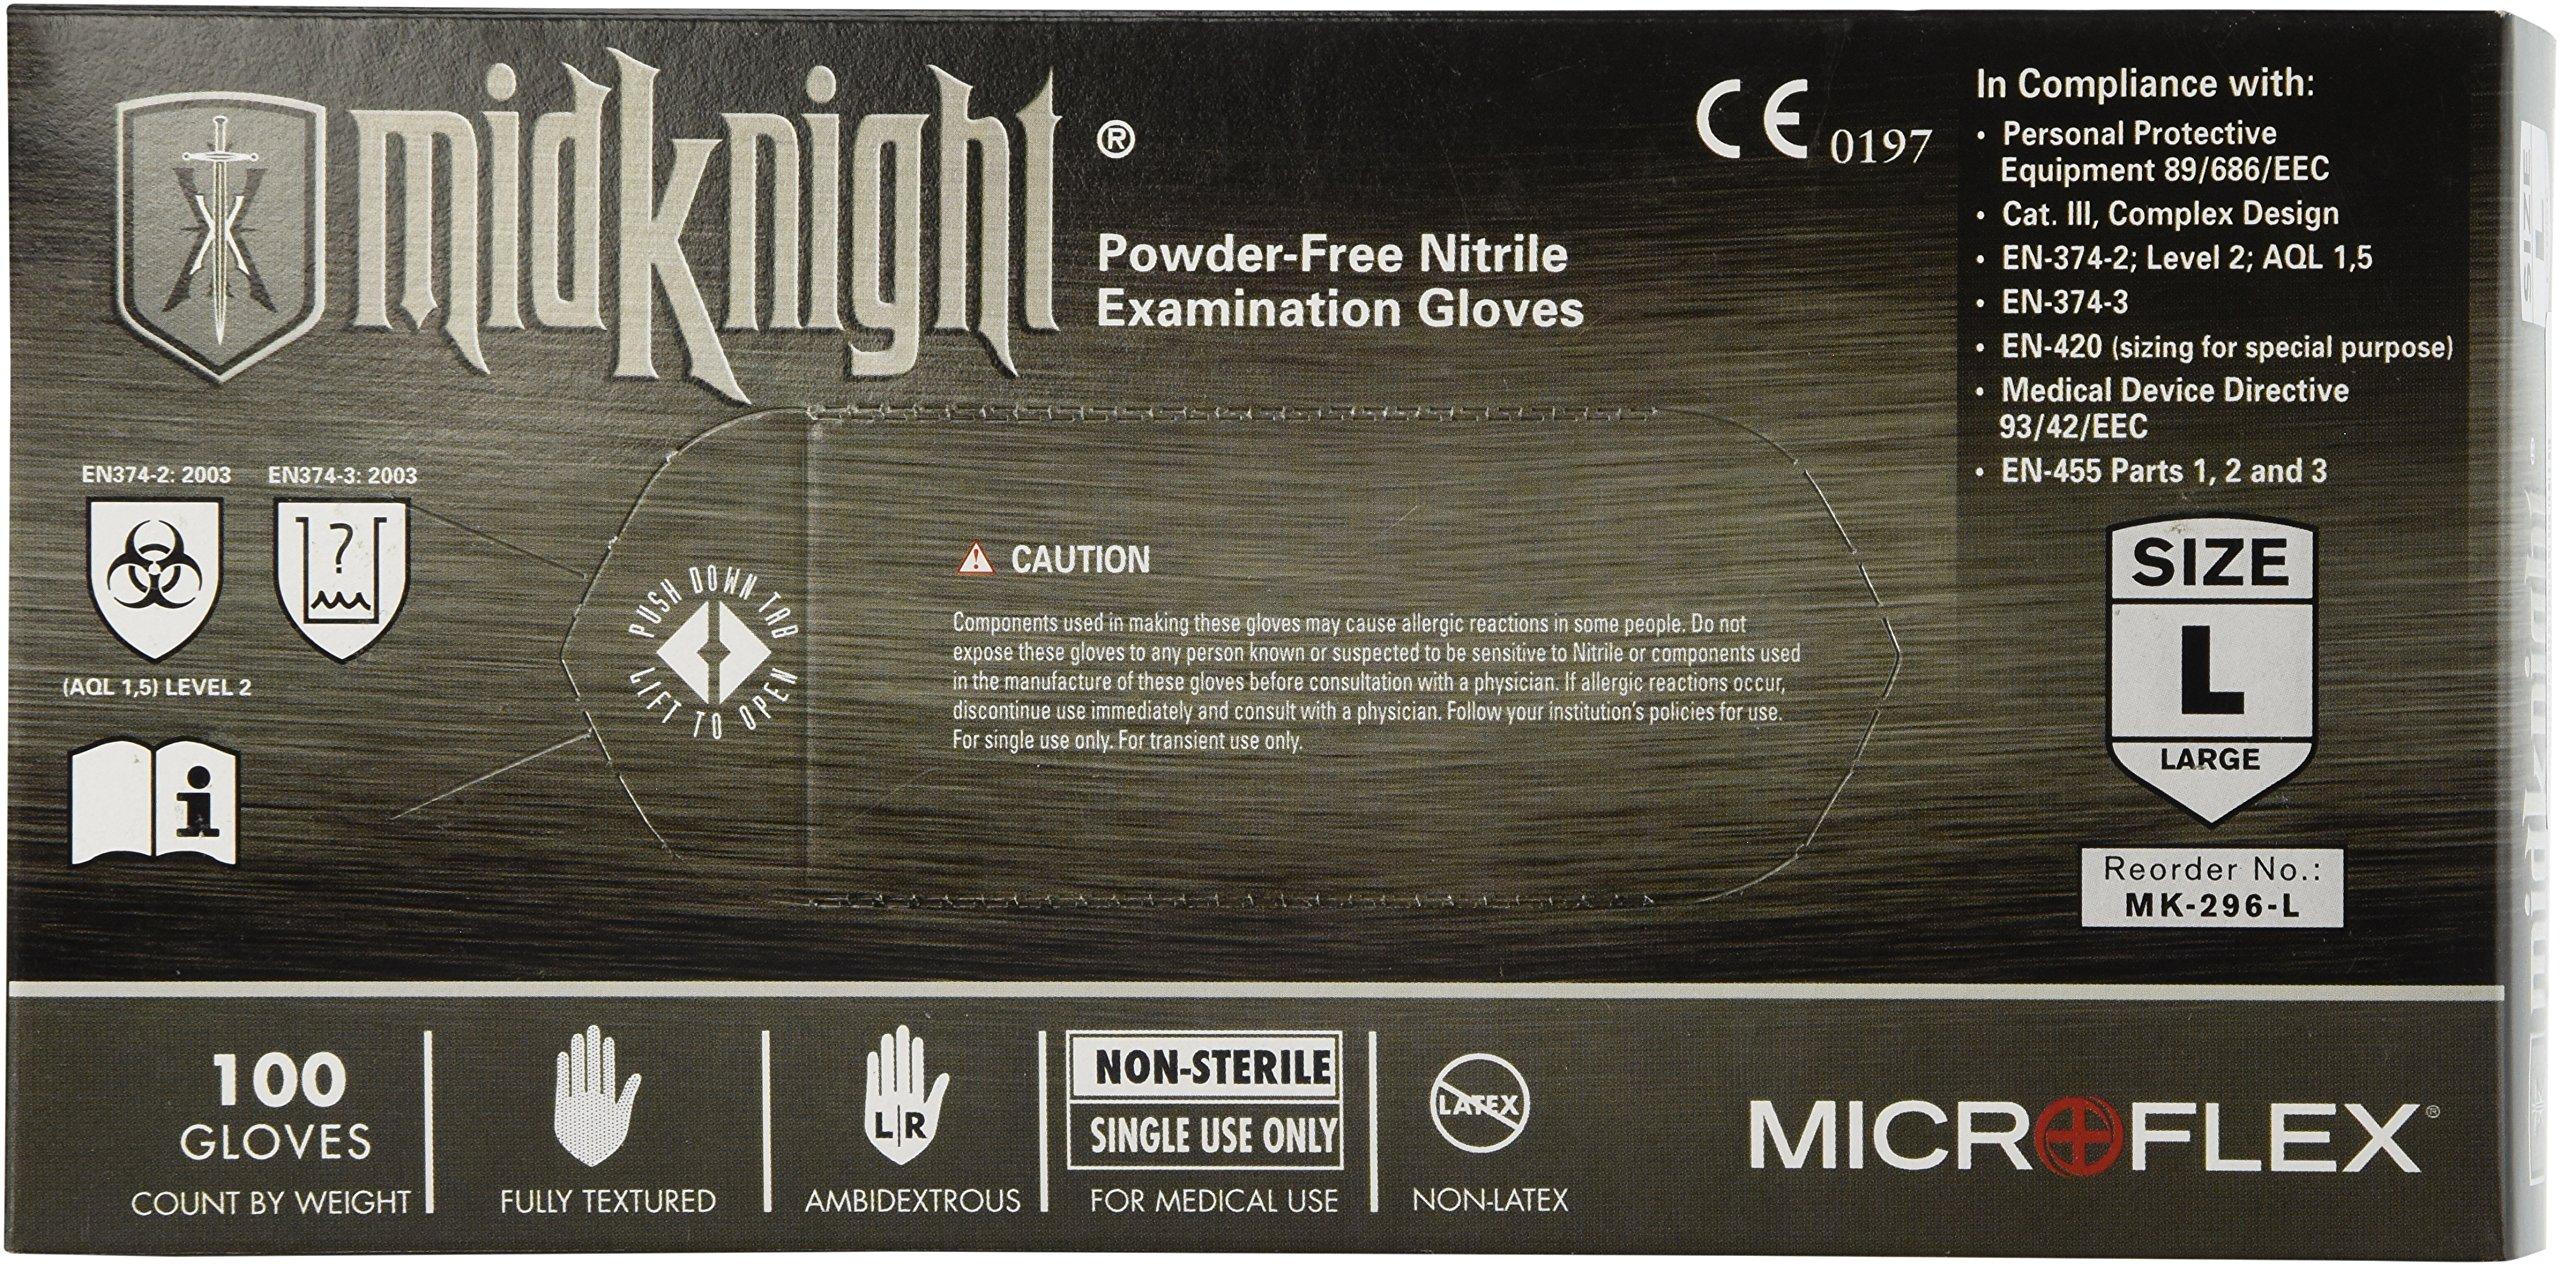 Microflex (MFXMK296L) MidKnight Black Powder-Free Nitrile Examination Gloves - Large, 100ct. by Microflex (Image #2)